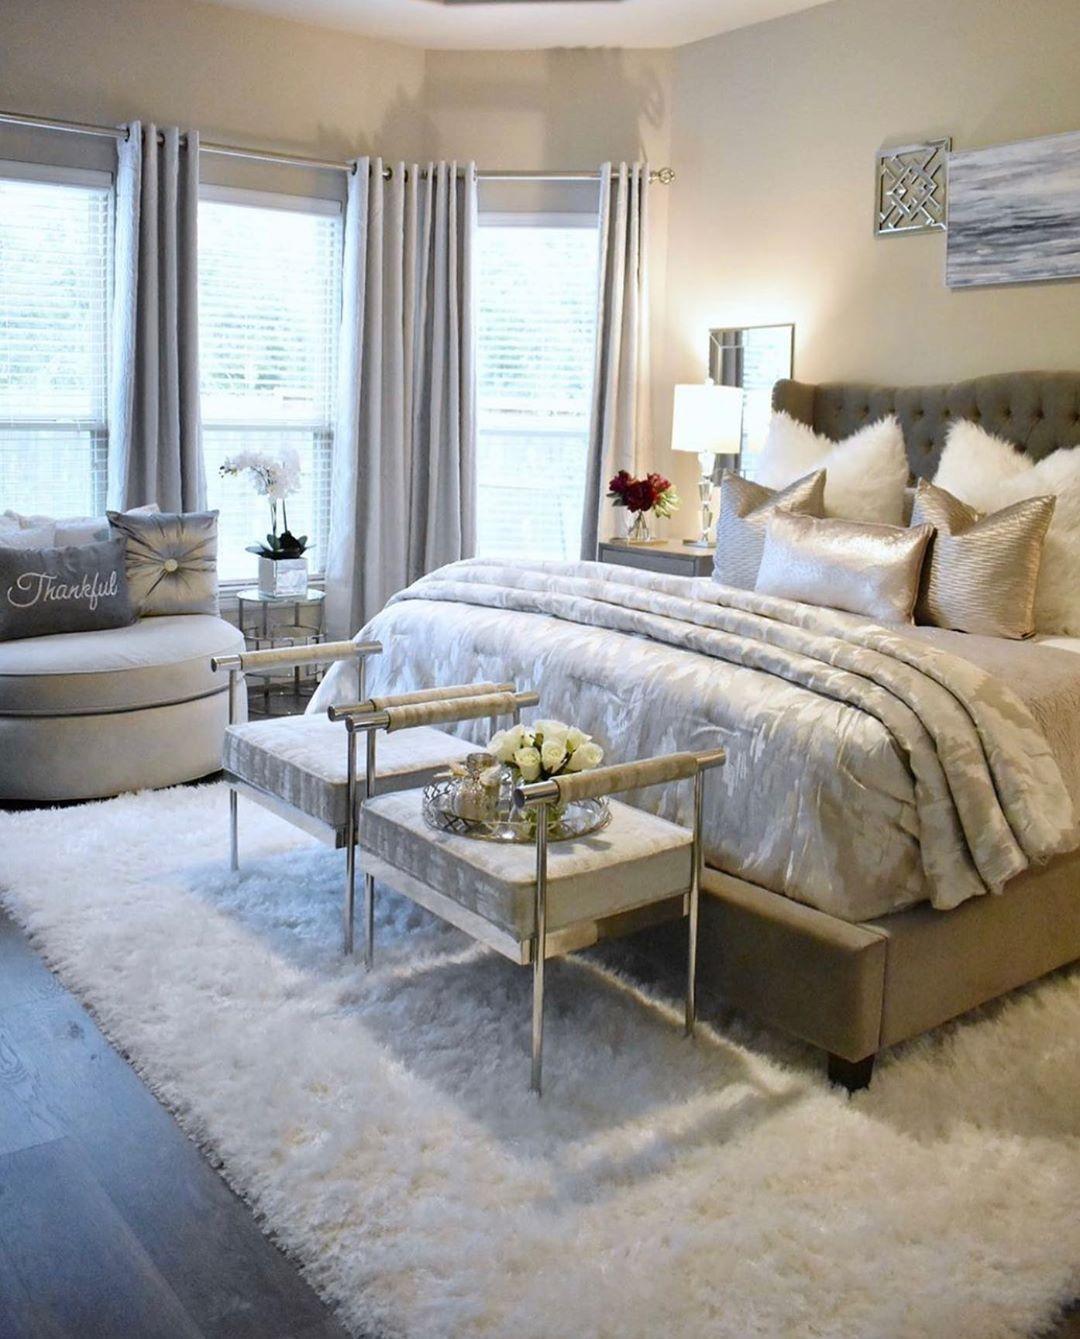 Helloo Gorgeous Prettiest Bedroom Design By Popsofcolorhome What S Your F Bedroom Bedroomdecor Bedroomgoals Bedroominspo Be Home Decor Shops Interior Design Home Decor Online